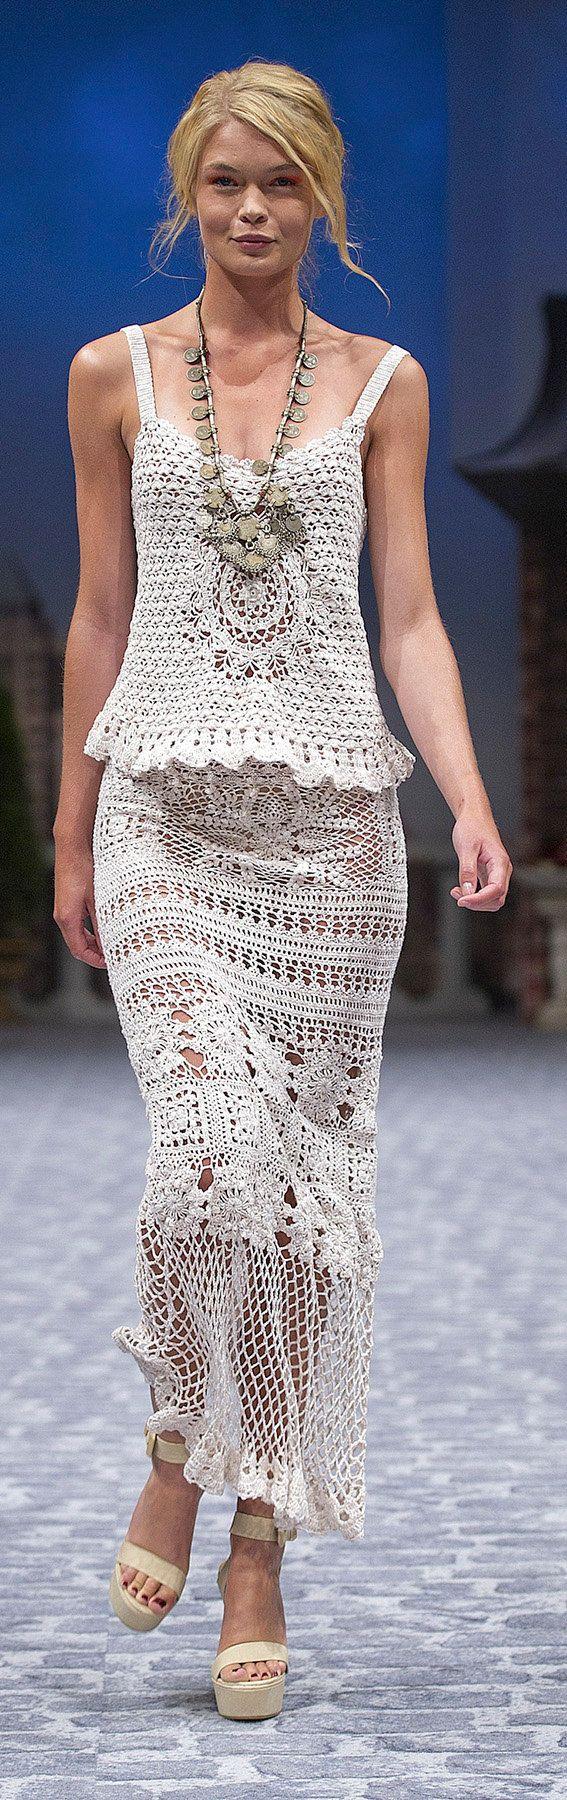 CROCHET FASHION TRENDS exclusive crochet twopiece by LecrochetArt, $600.00